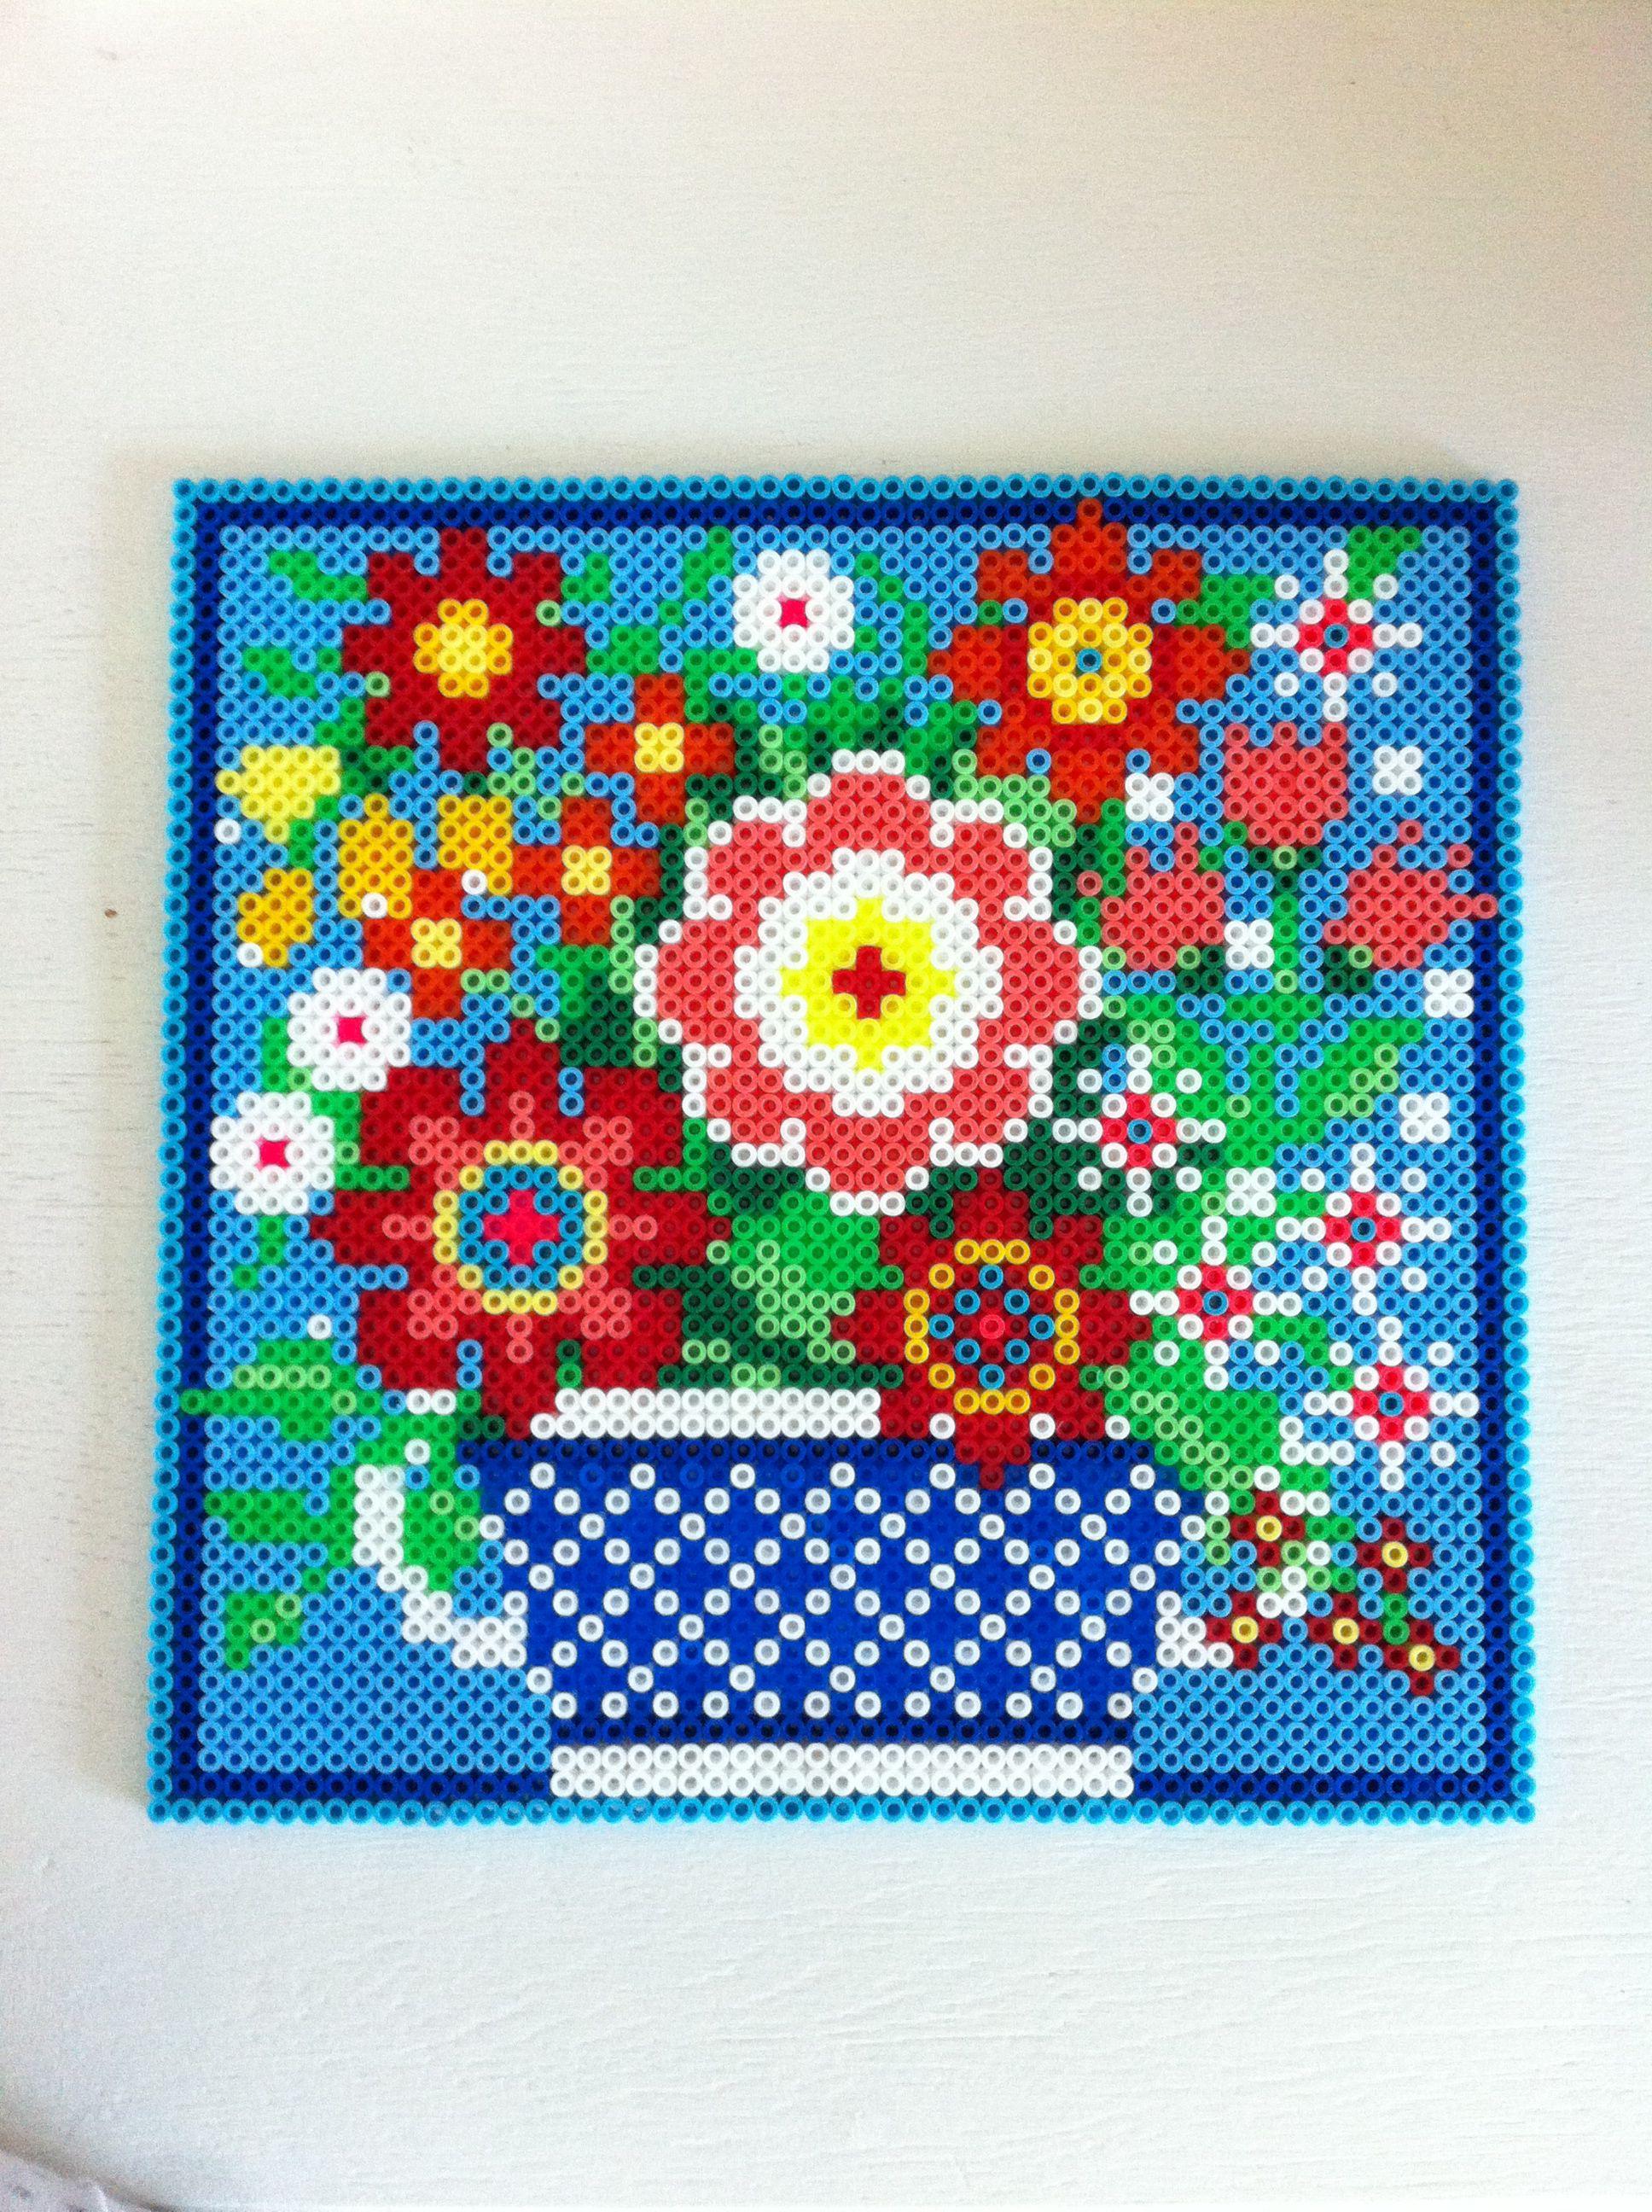 Perler Bead Flower Pot Pattern | Craft Sites - Perler Bead Patterns ...